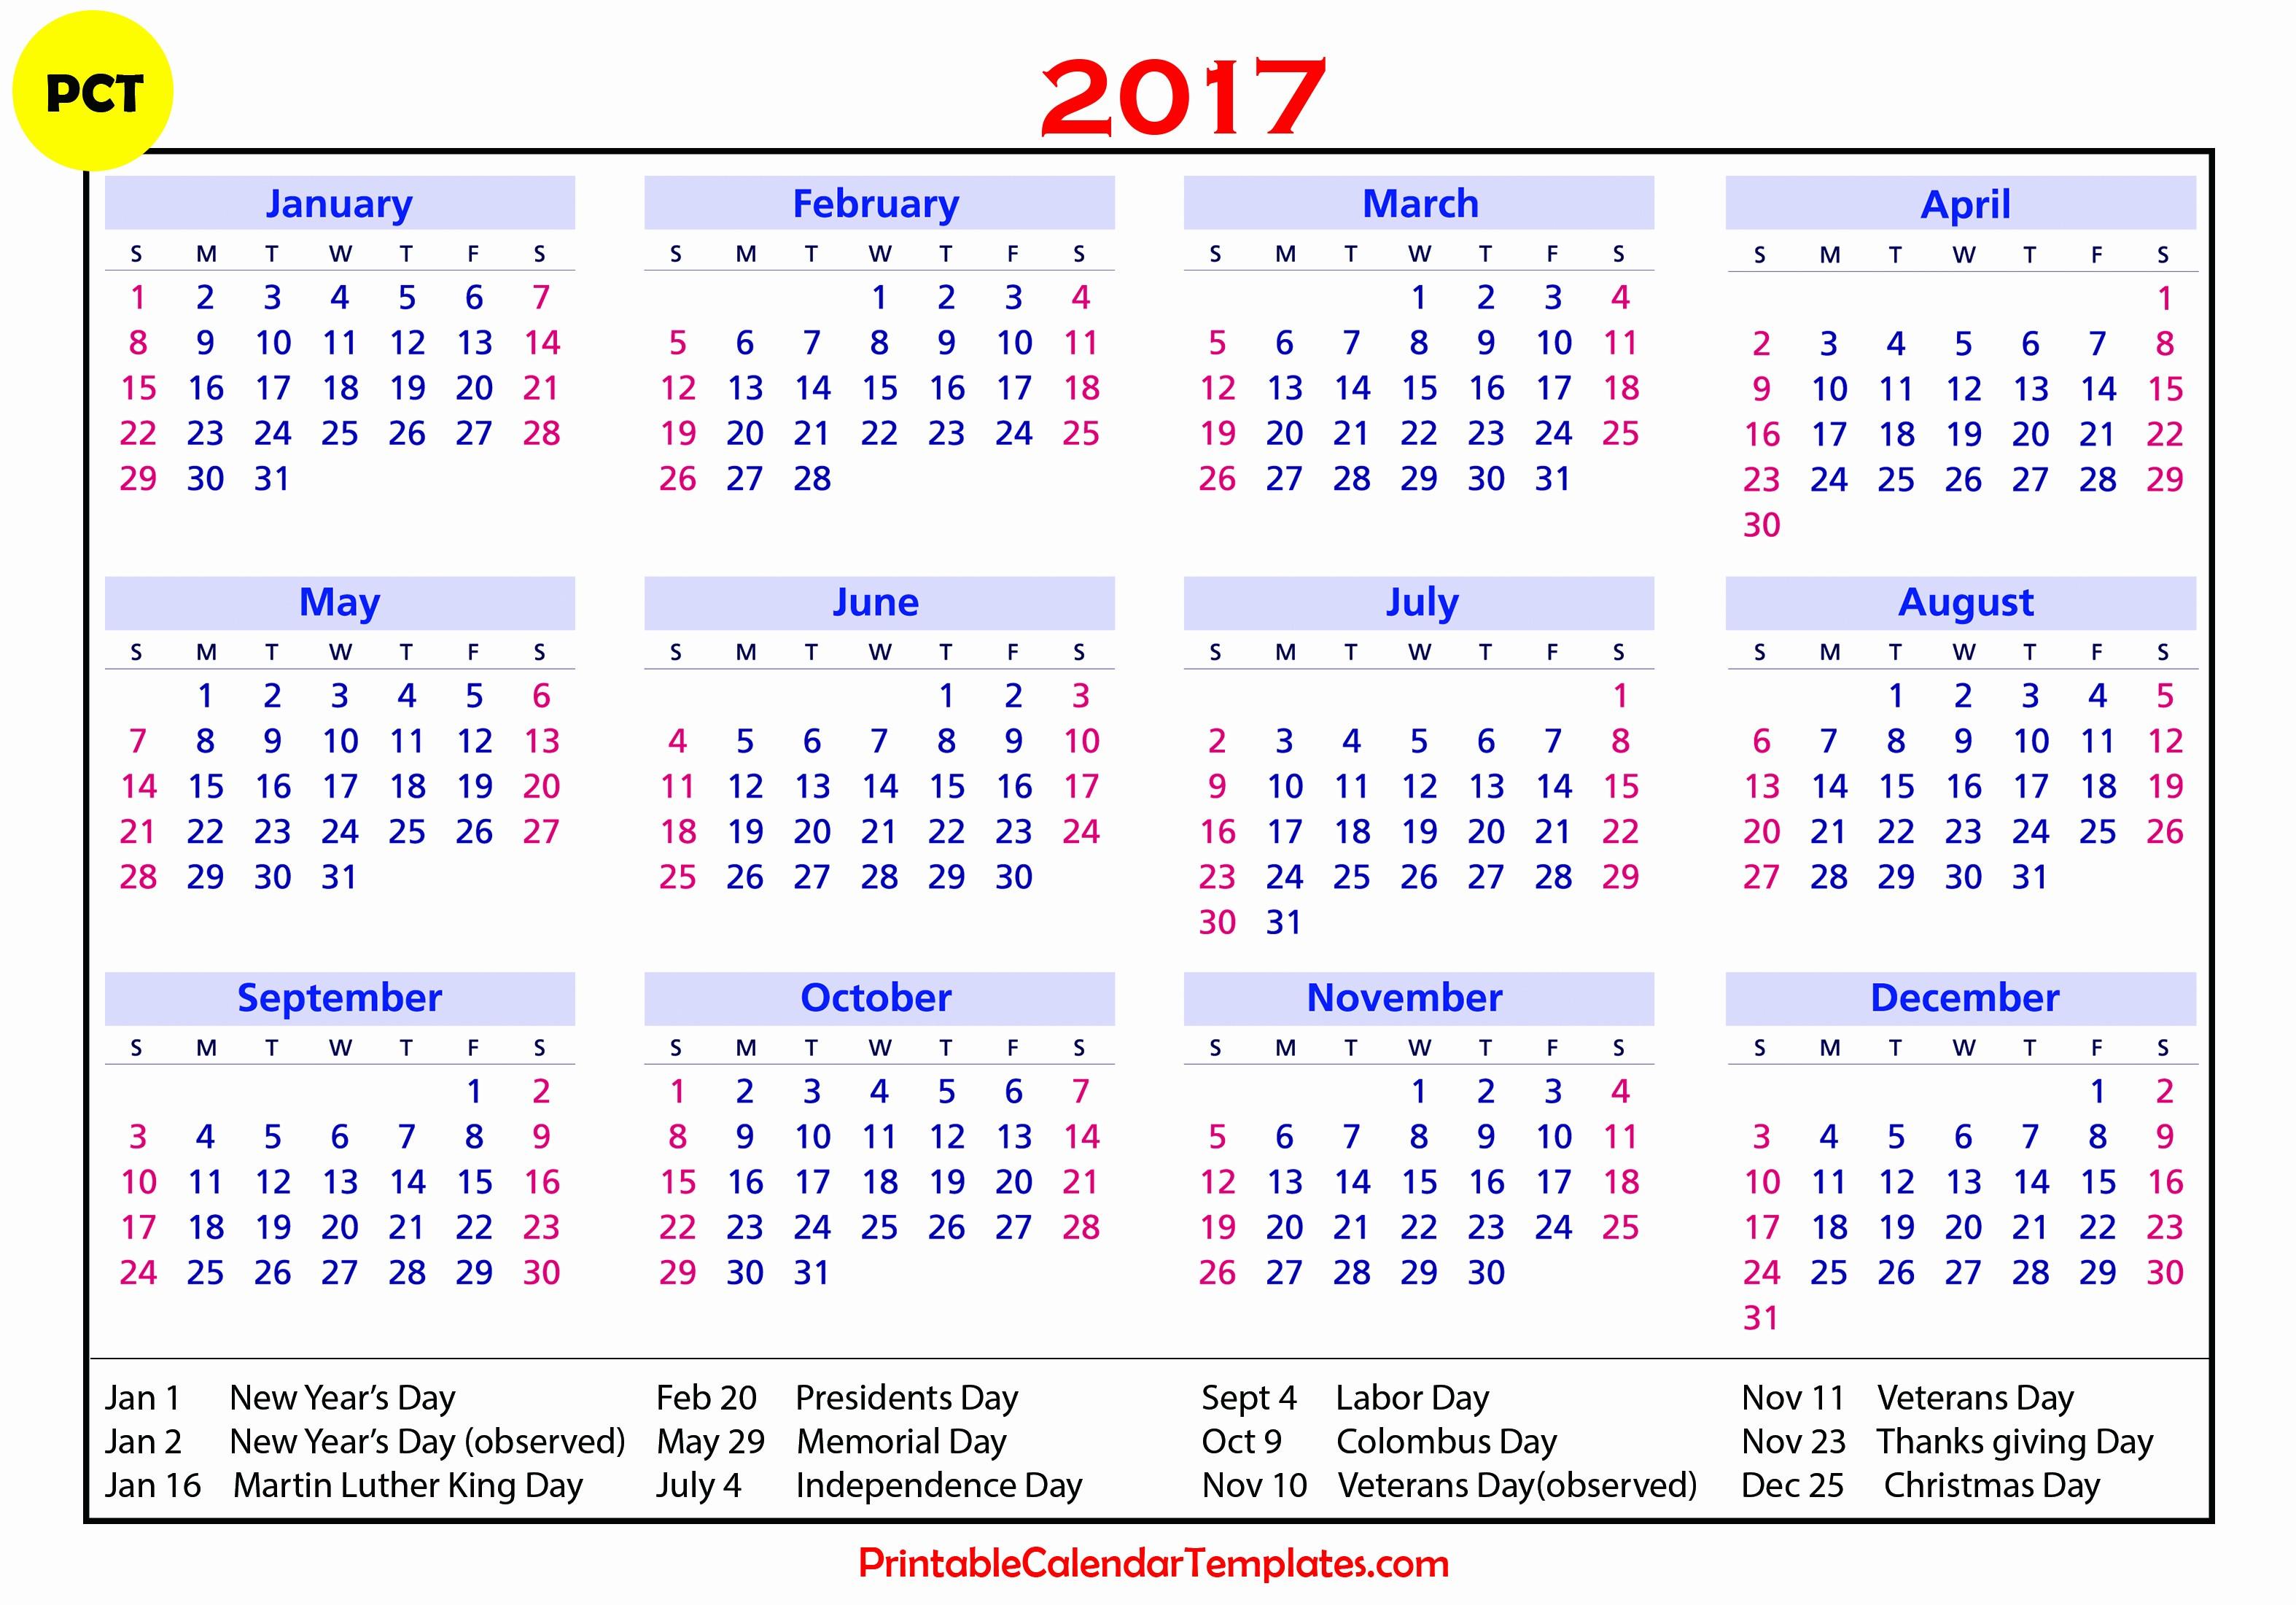 Calendar 2017 Template with Holidays New 2017 Calendar with Holidays